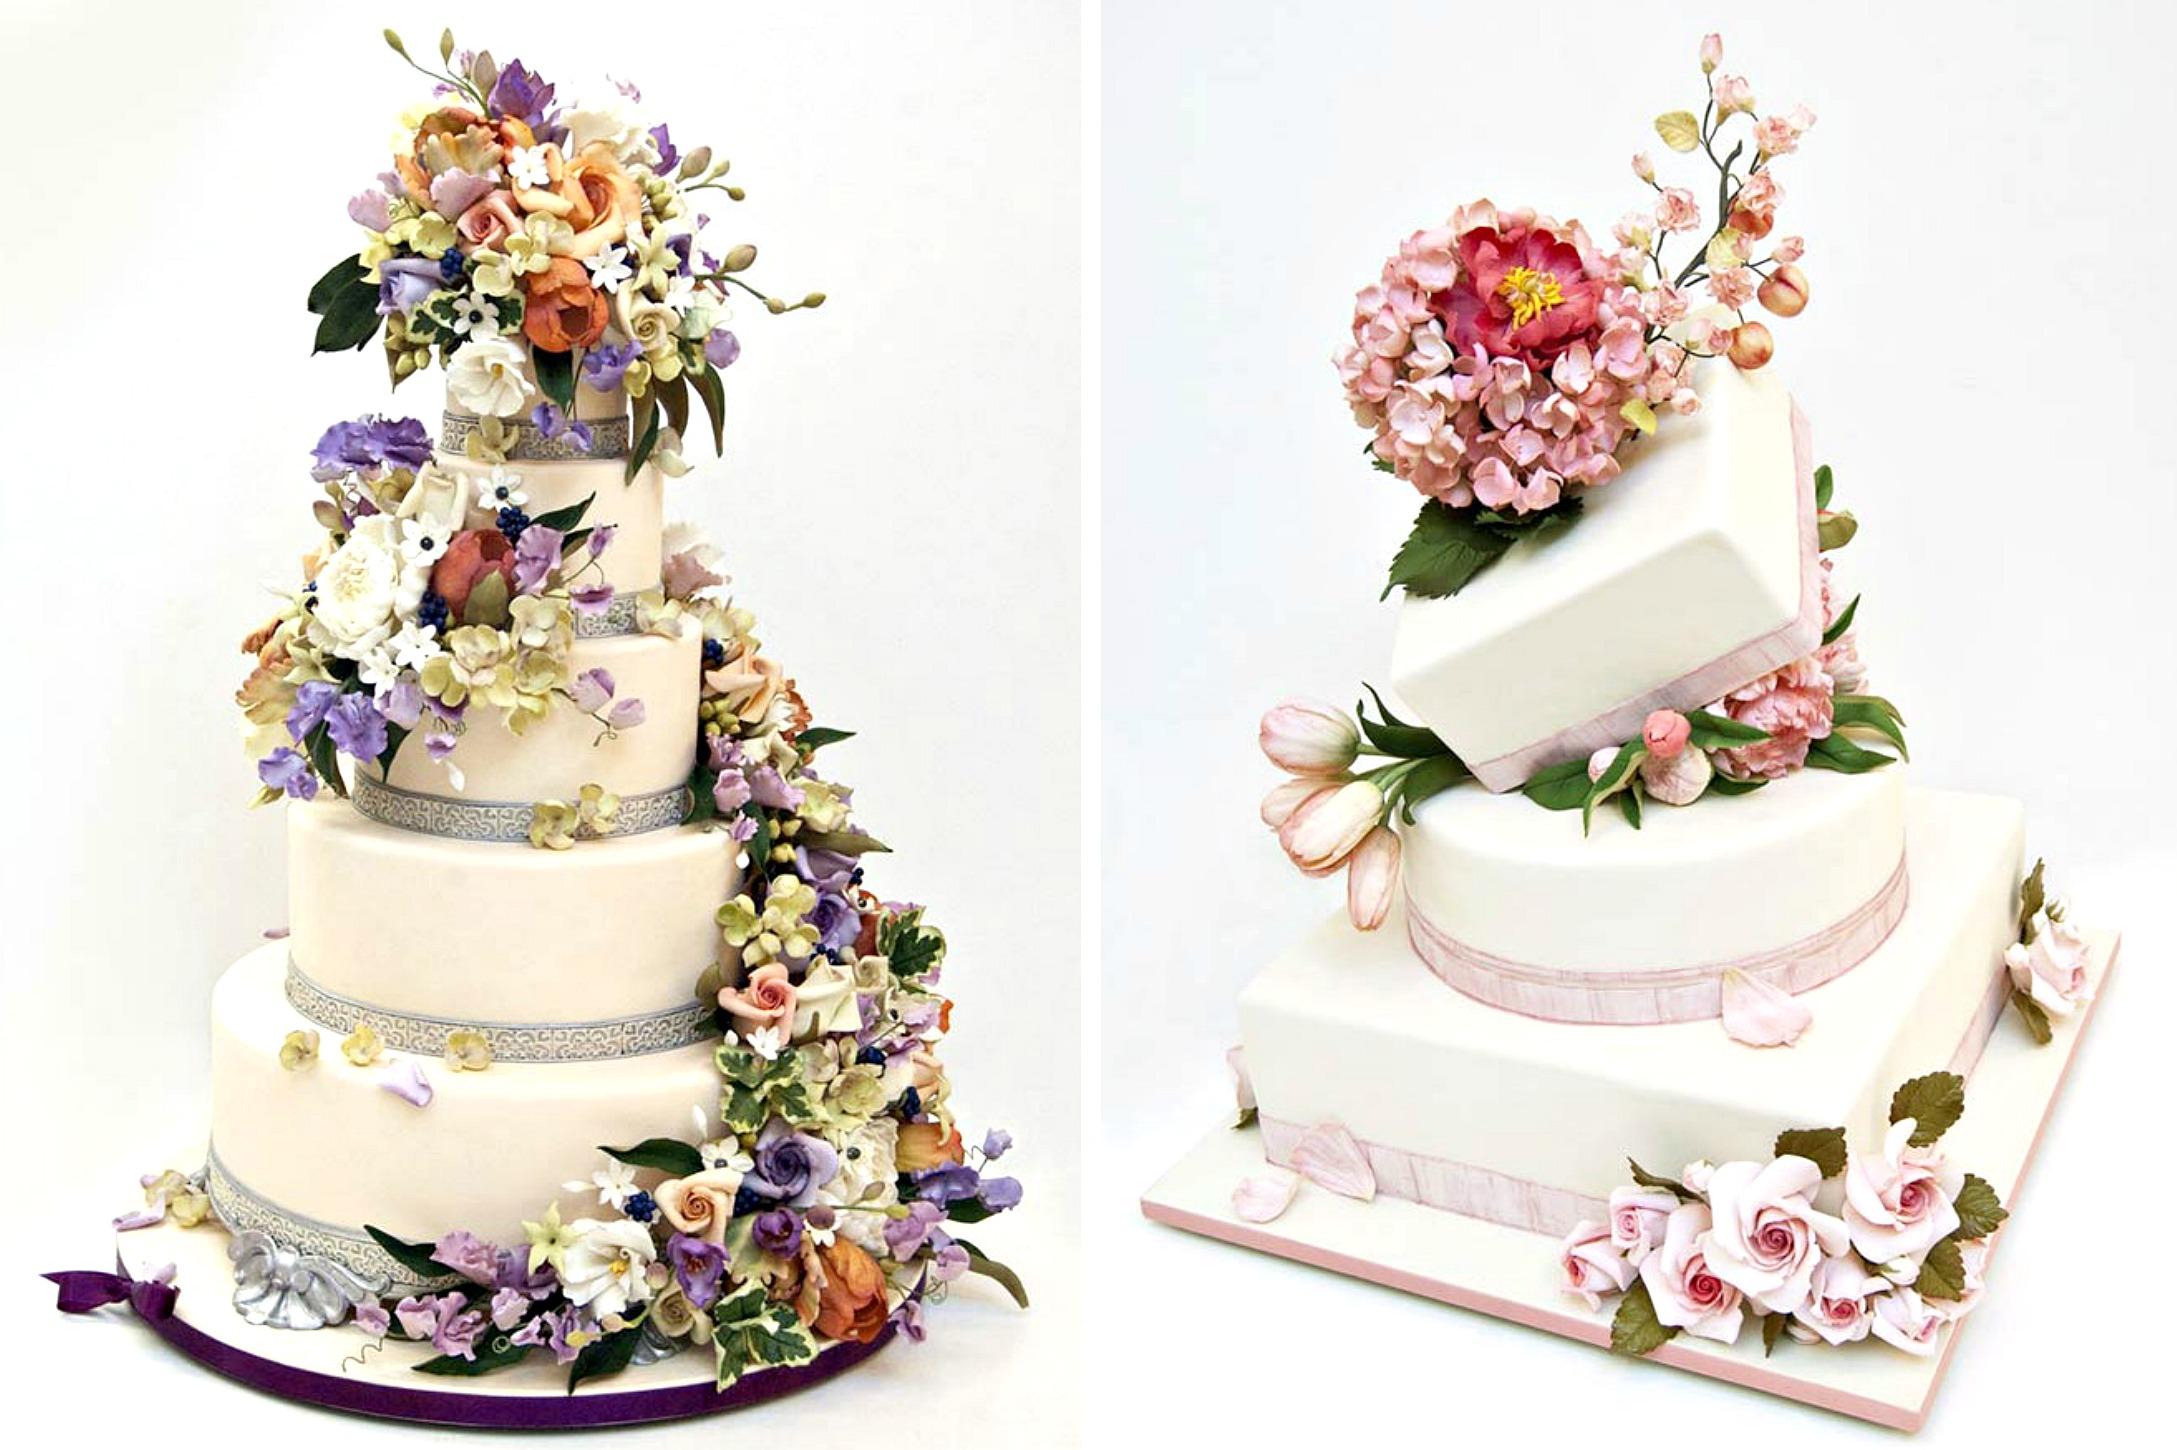 Do Wedding Cakes Have Writing On Them